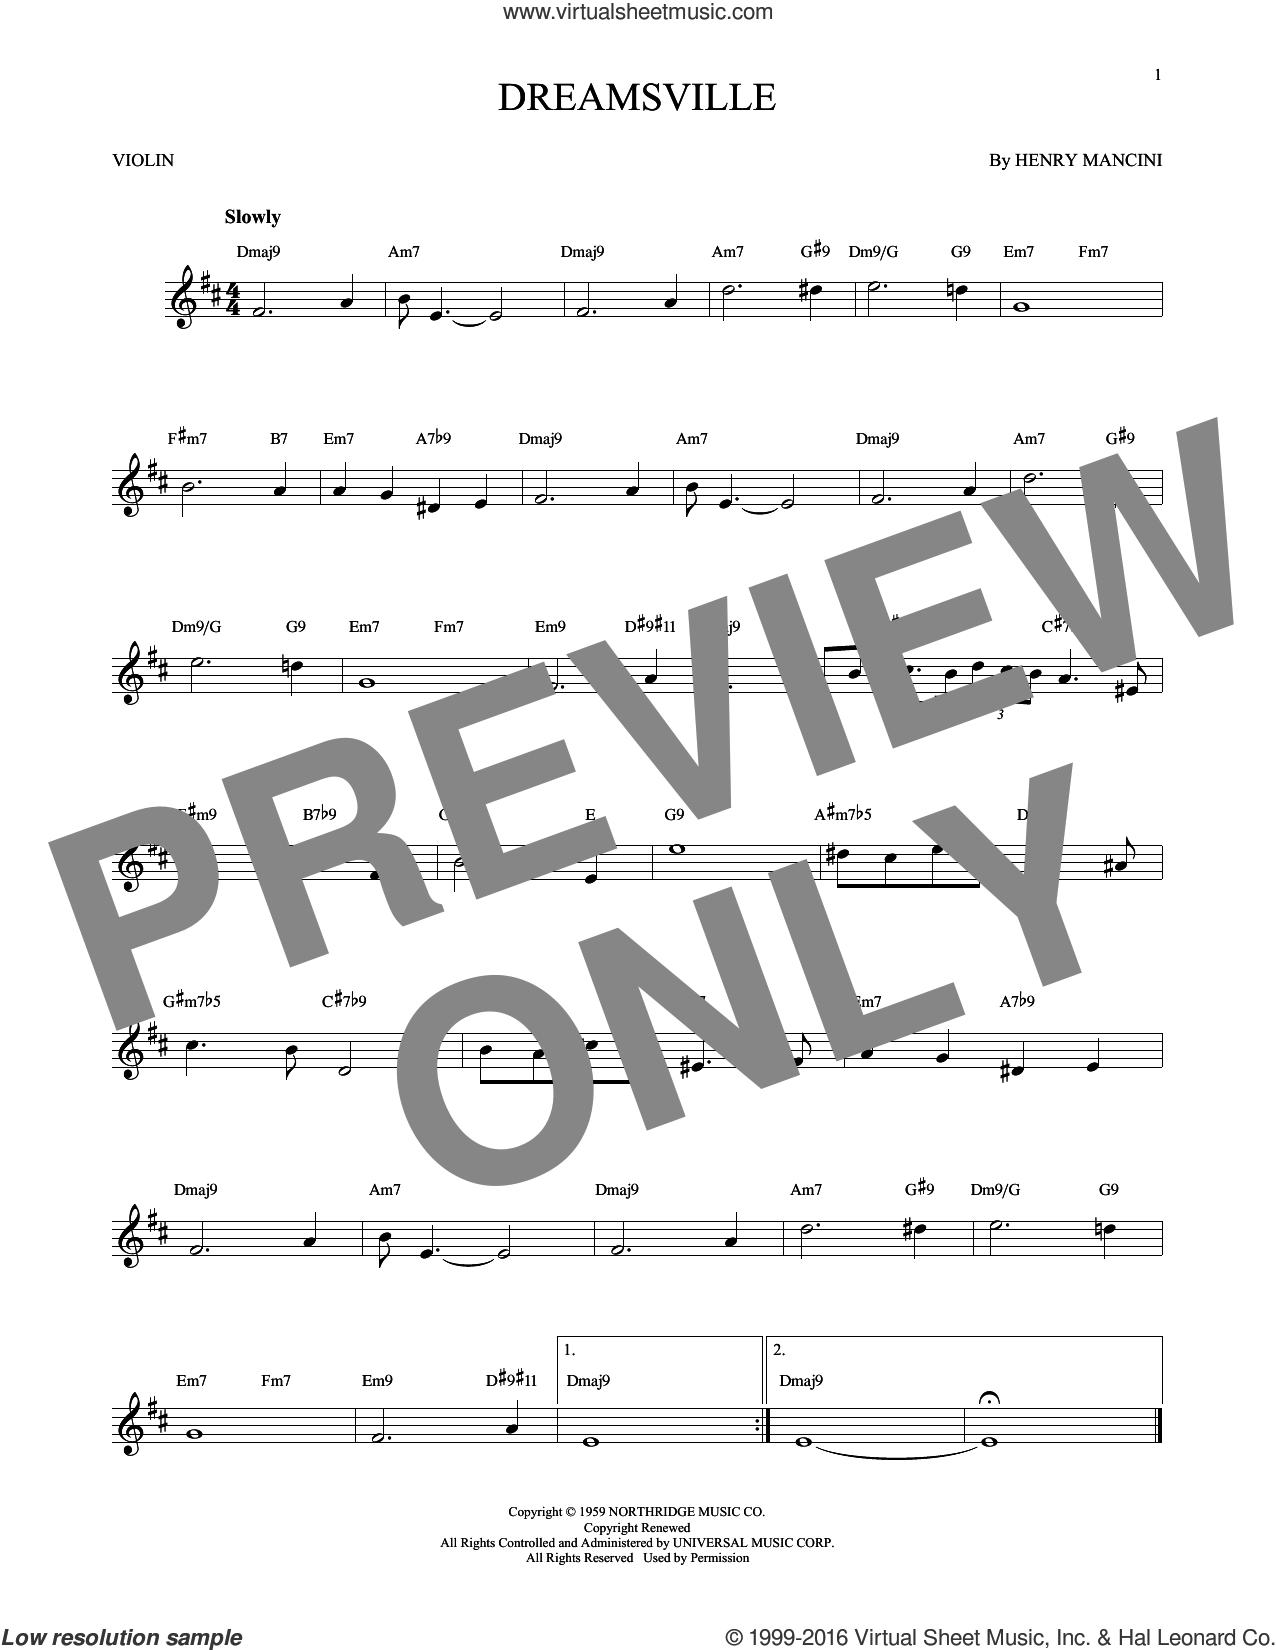 Dreamsville sheet music for violin solo by Henry Mancini, intermediate skill level